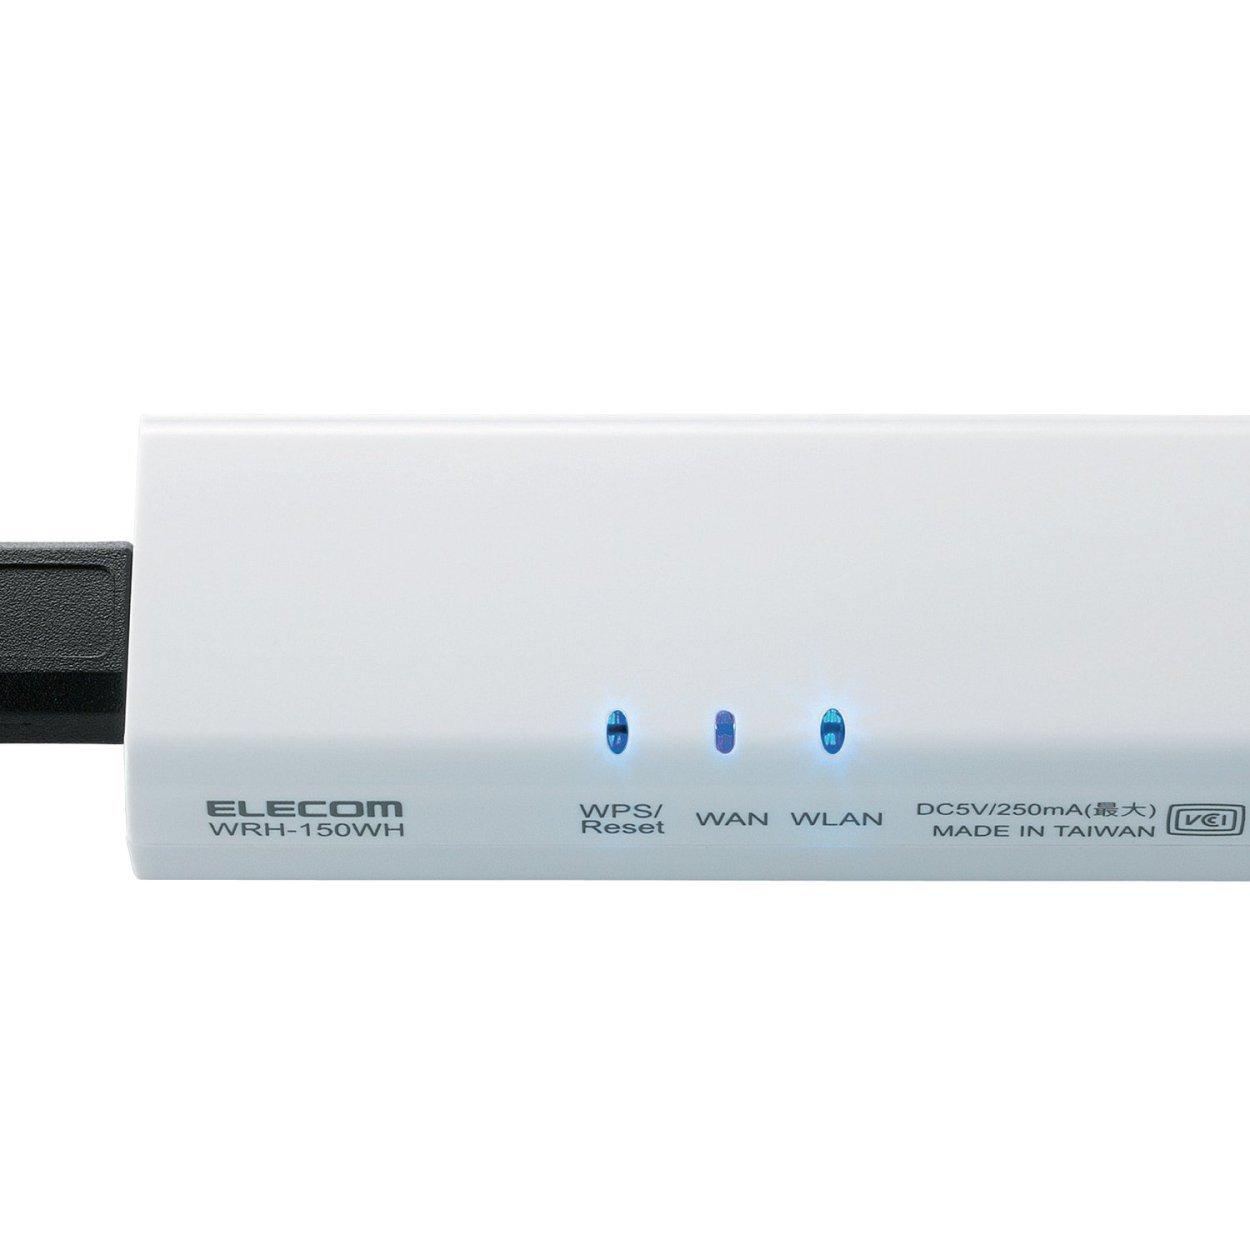 ELECOM WRH-150WH-G Router Treiber Herunterladen